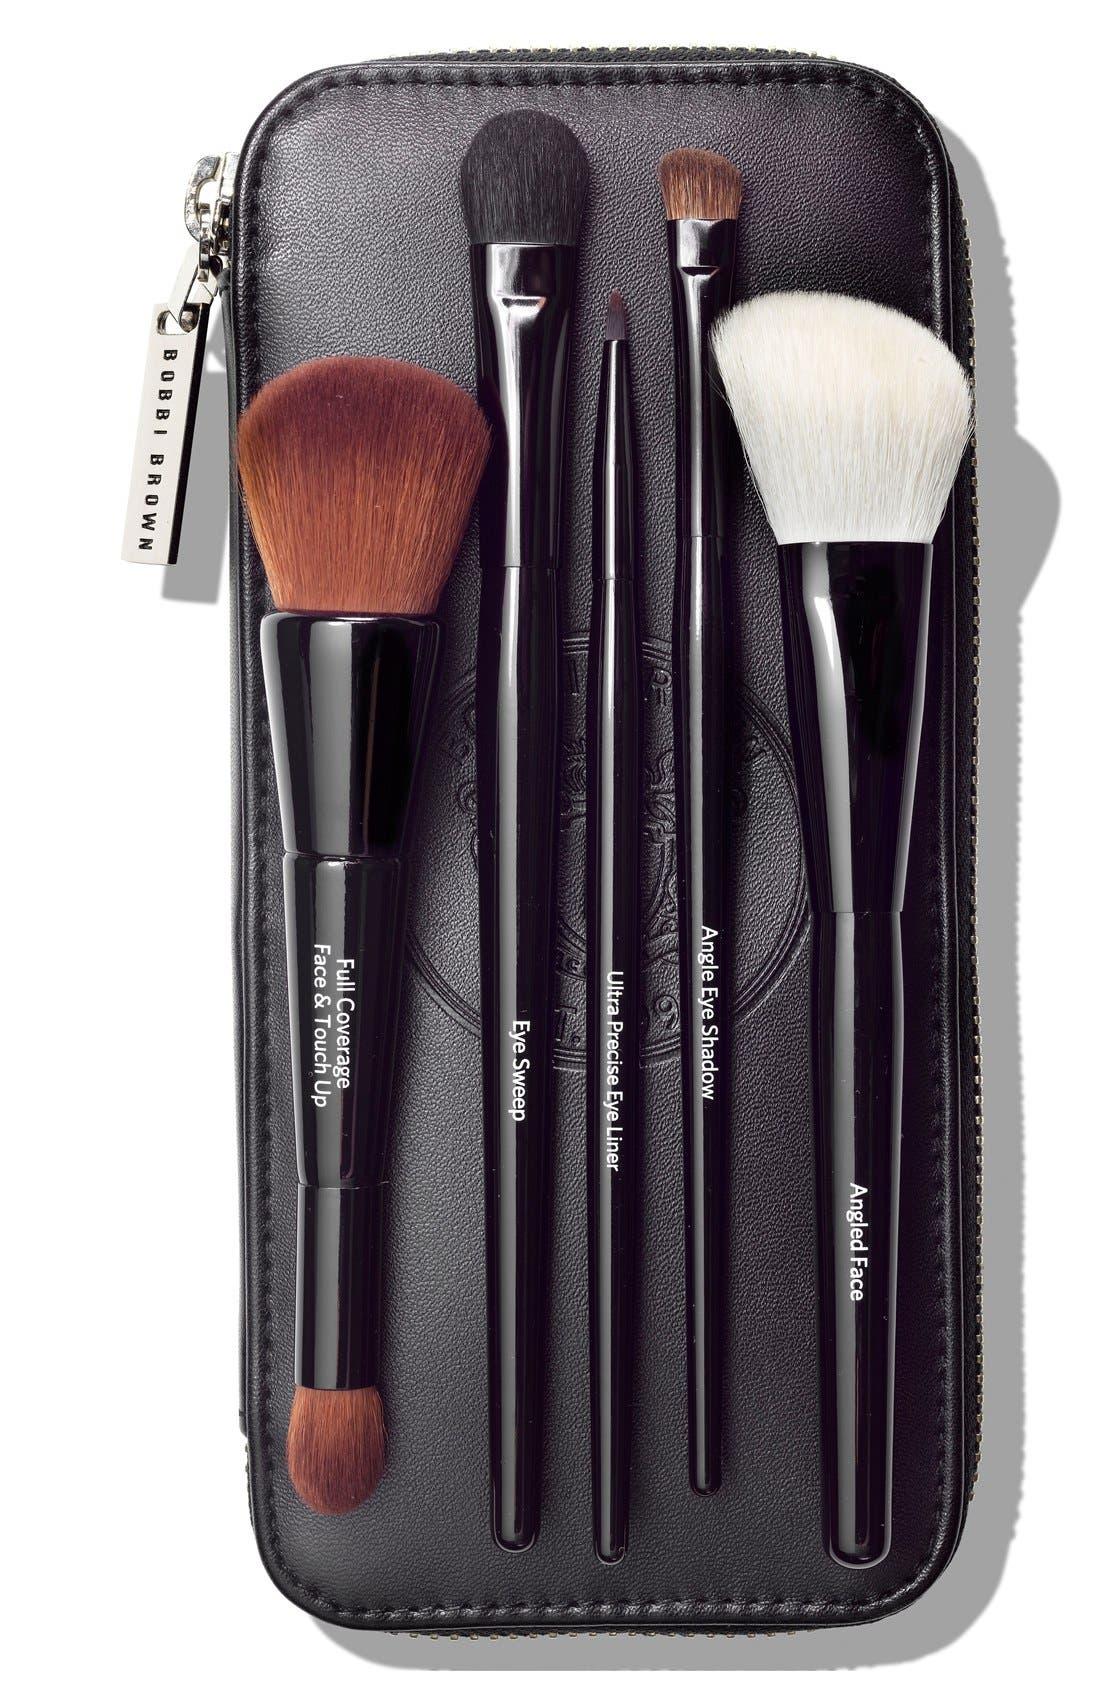 'Bobbi on Trend - Full-Size Brushes' Set,                         Main,                         color, 000